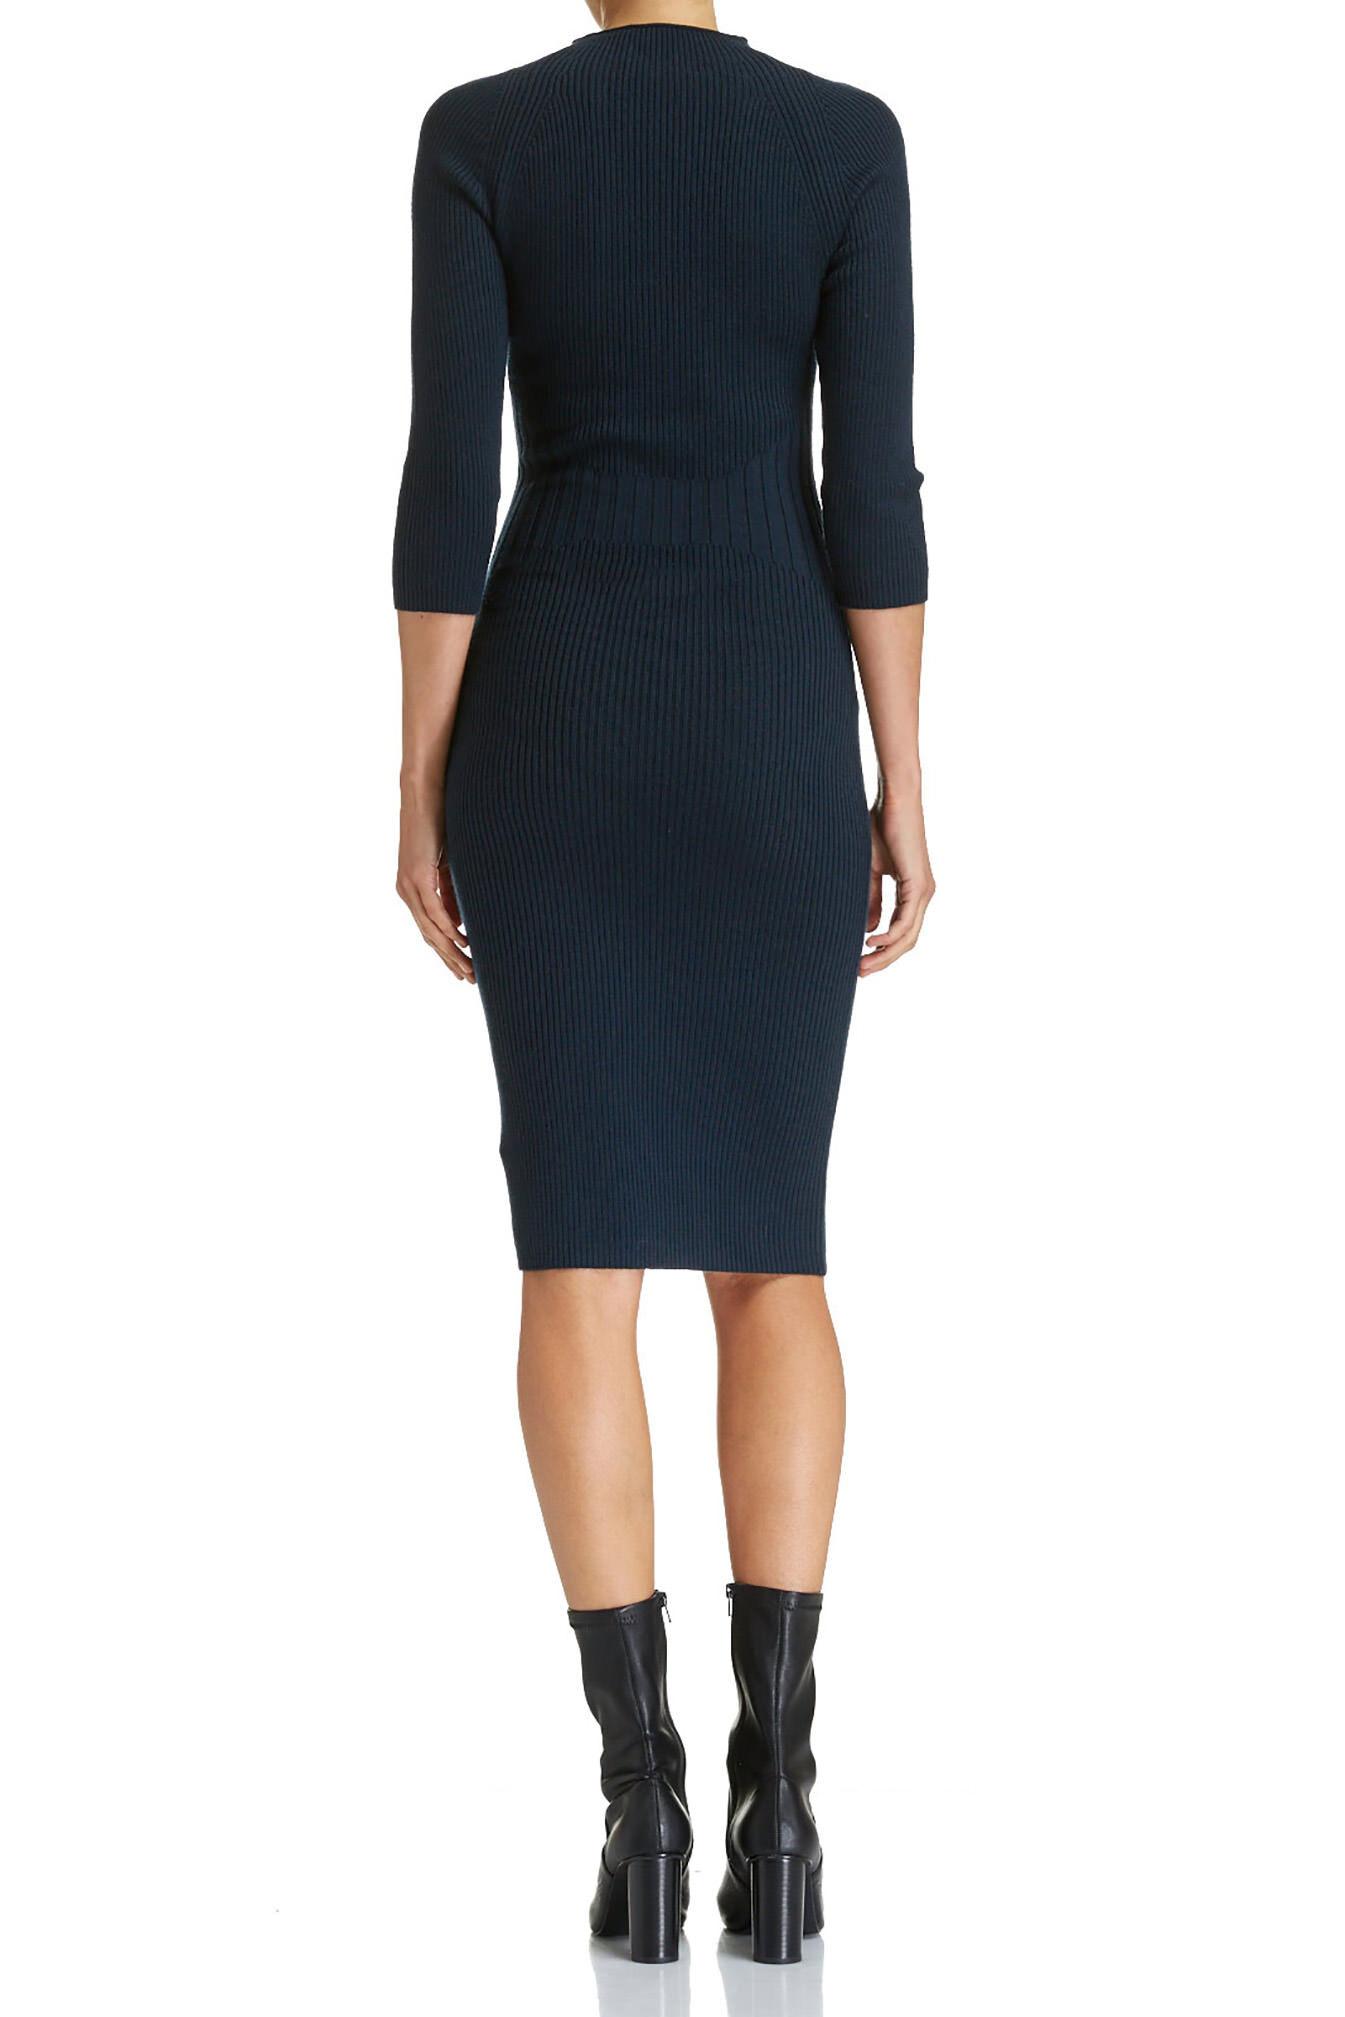 NEW-SABA-WOMENS-Ava-Rib-Dress-Dresses